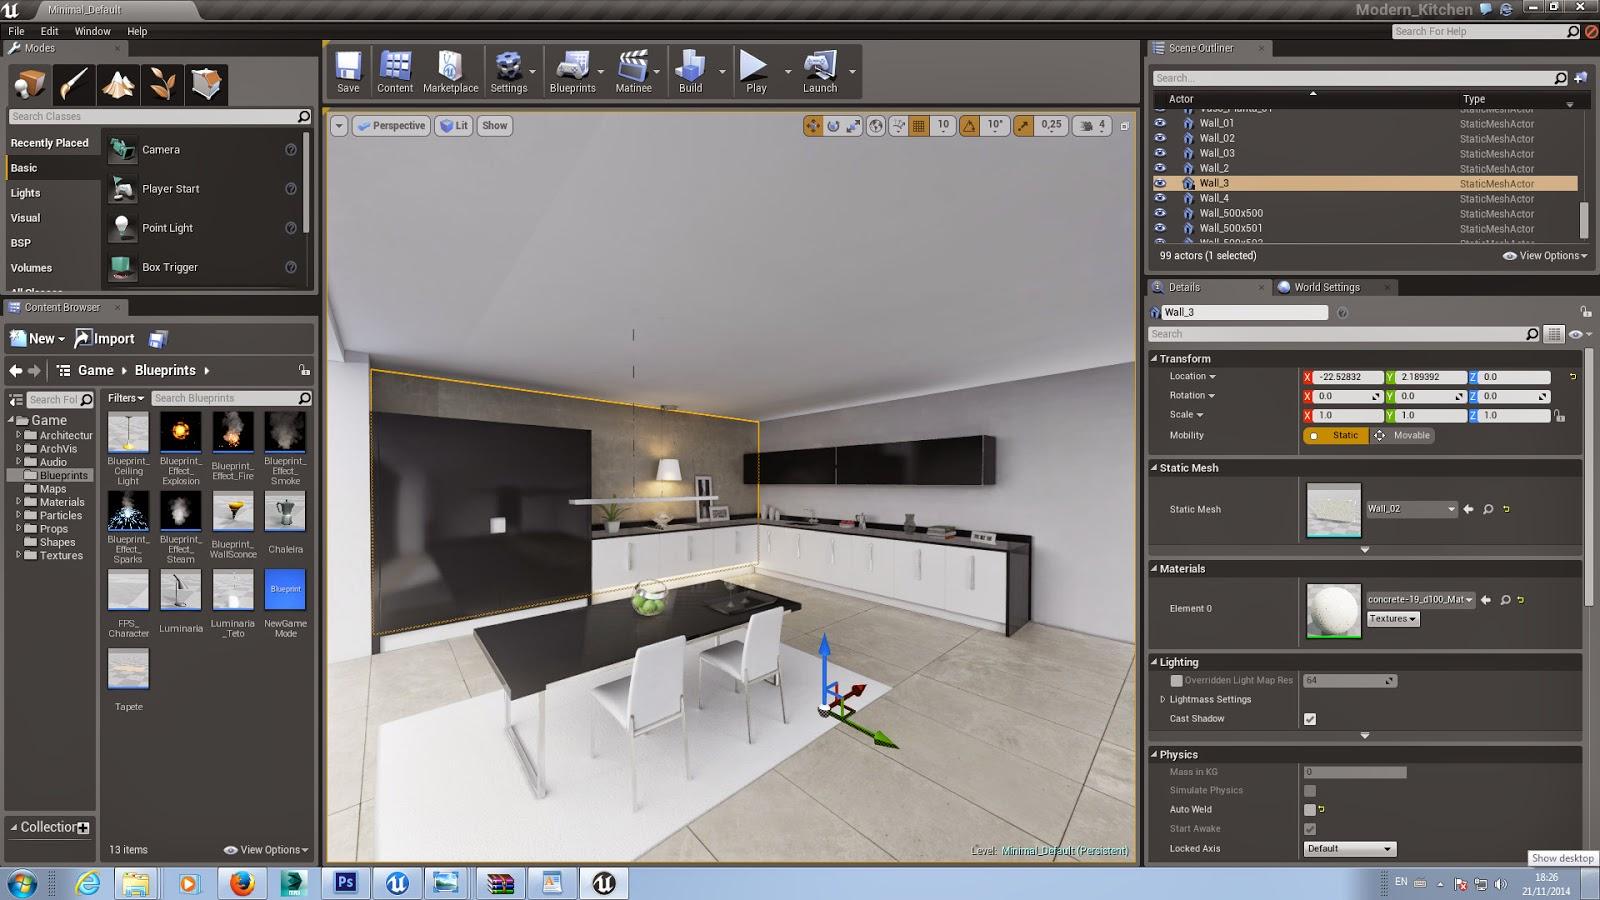 Unreal engine 4 for archviz basic tutorial cg tutorial for Unreal engine 4 architecture